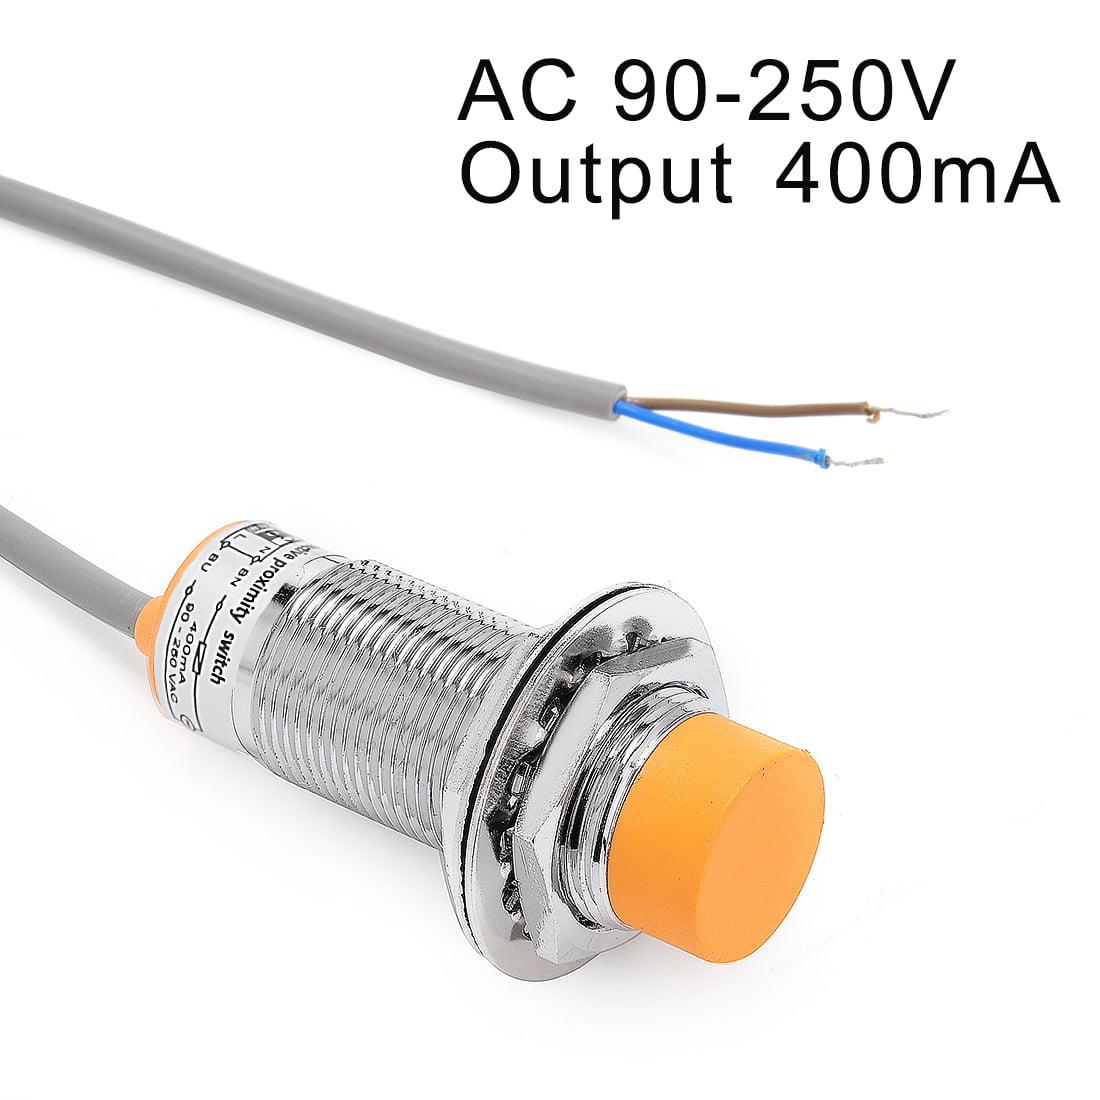 Ljc24a3 T J Ez 1 20mm Capacitance Proximity Sensor Switch No Ac 90 Circuit 250v 400ma